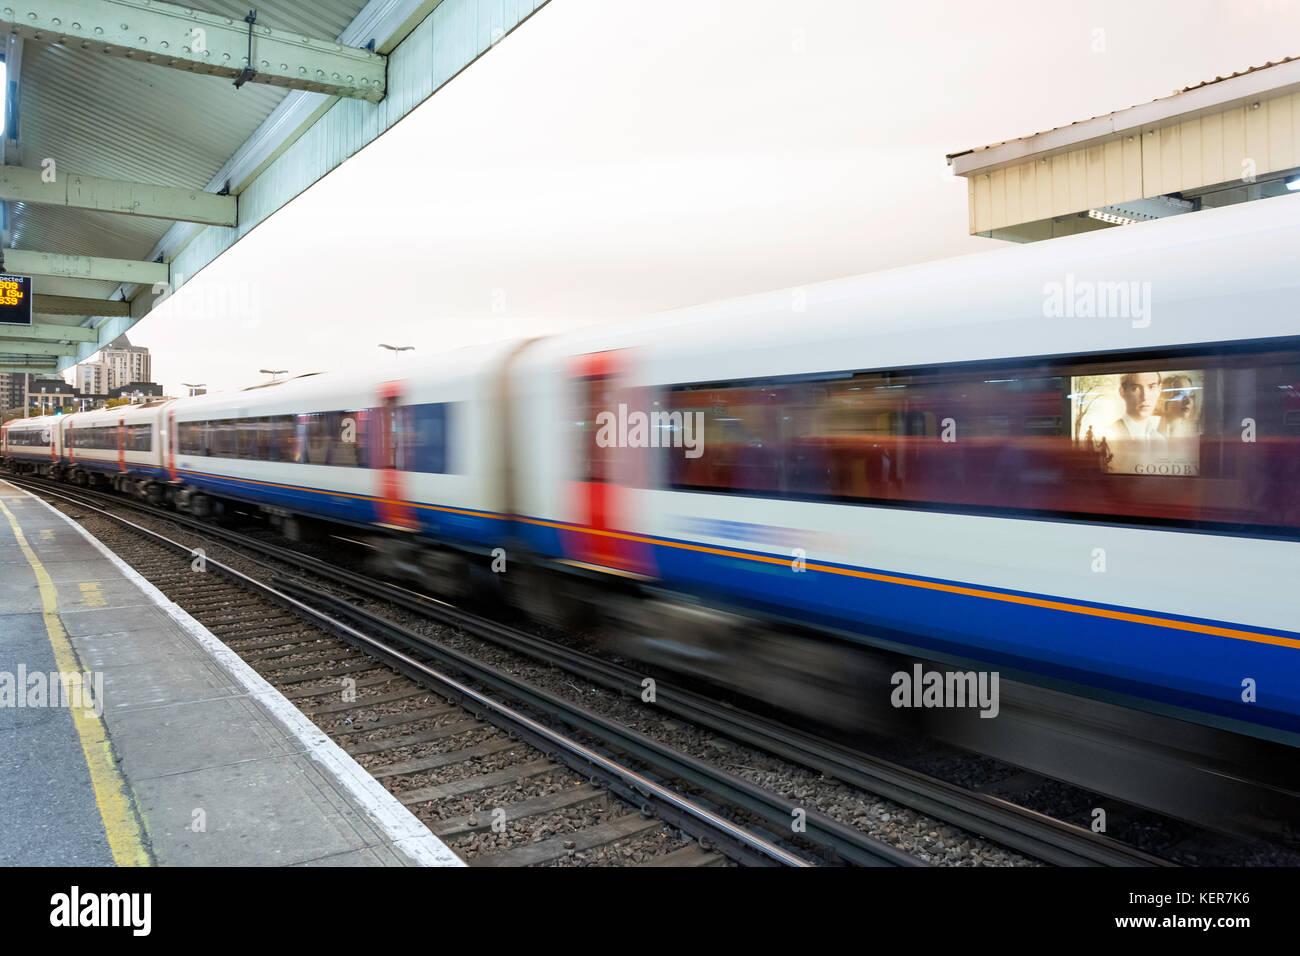 Speeding train passing through Vauxhall Station, Vauxhall, Greater London, England, United Kingdom - Stock Image